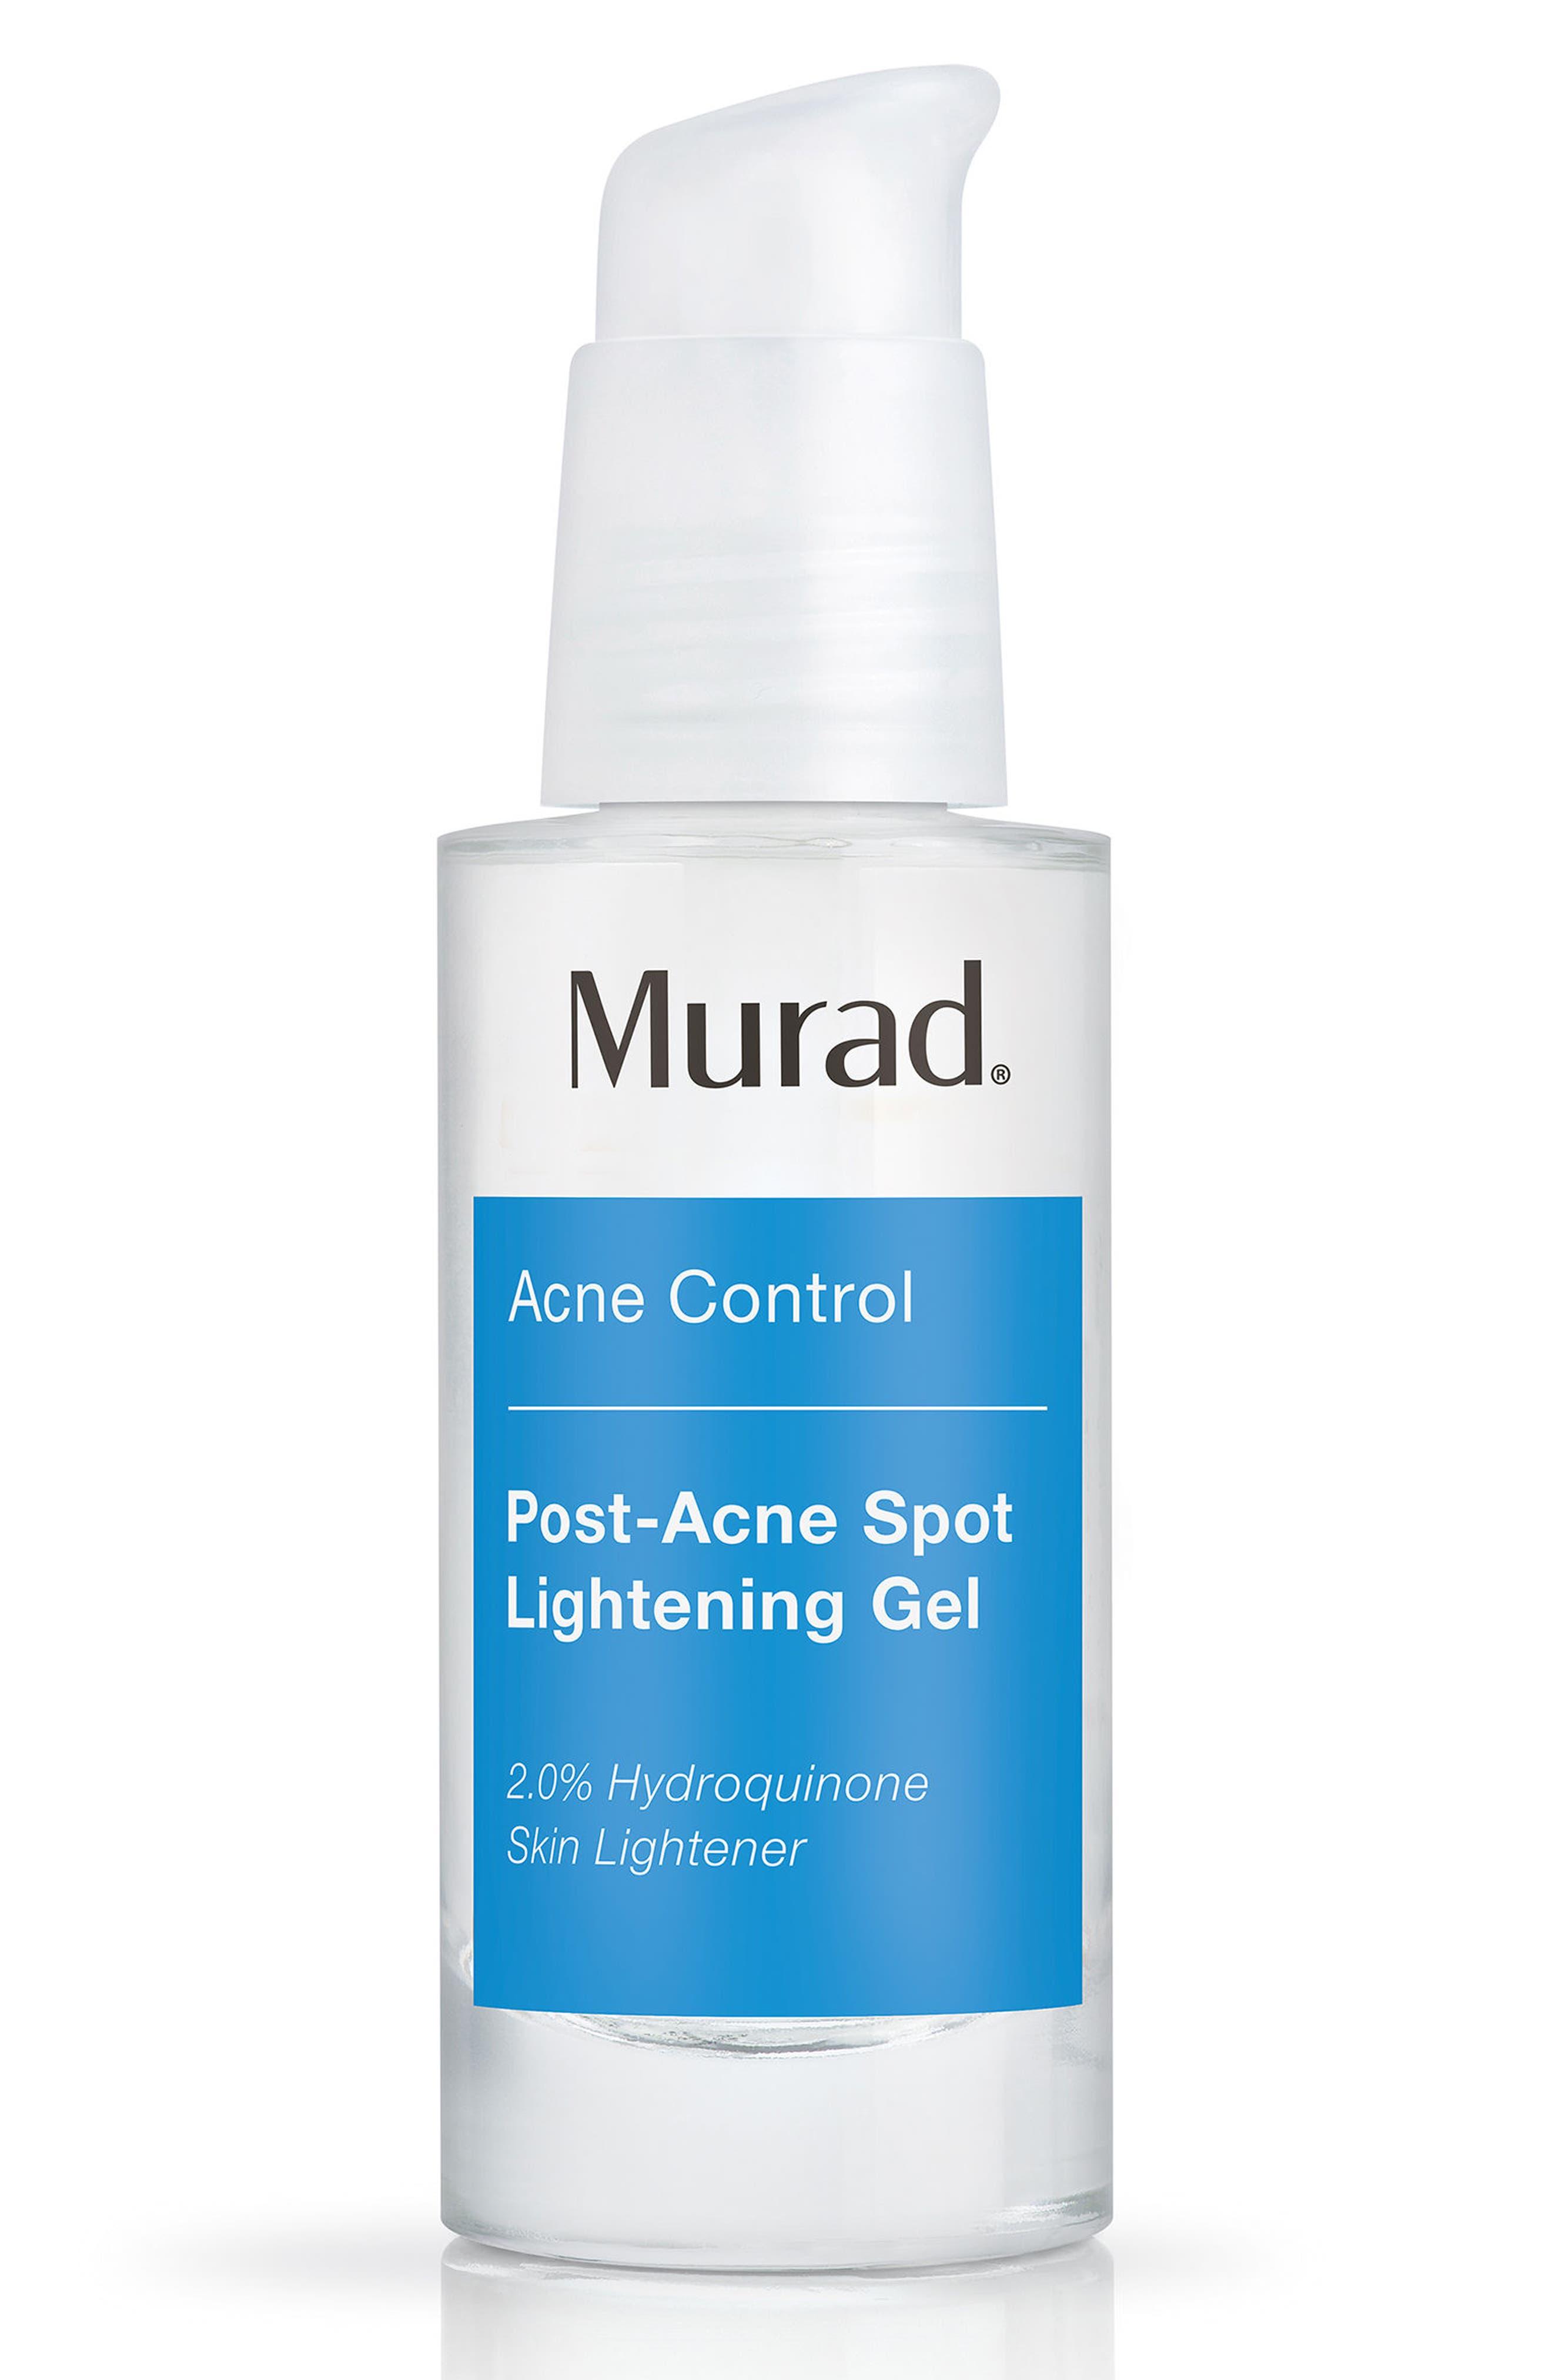 Post-Acne Spot Lightening Gel,                             Main thumbnail 1, color,                             No Color